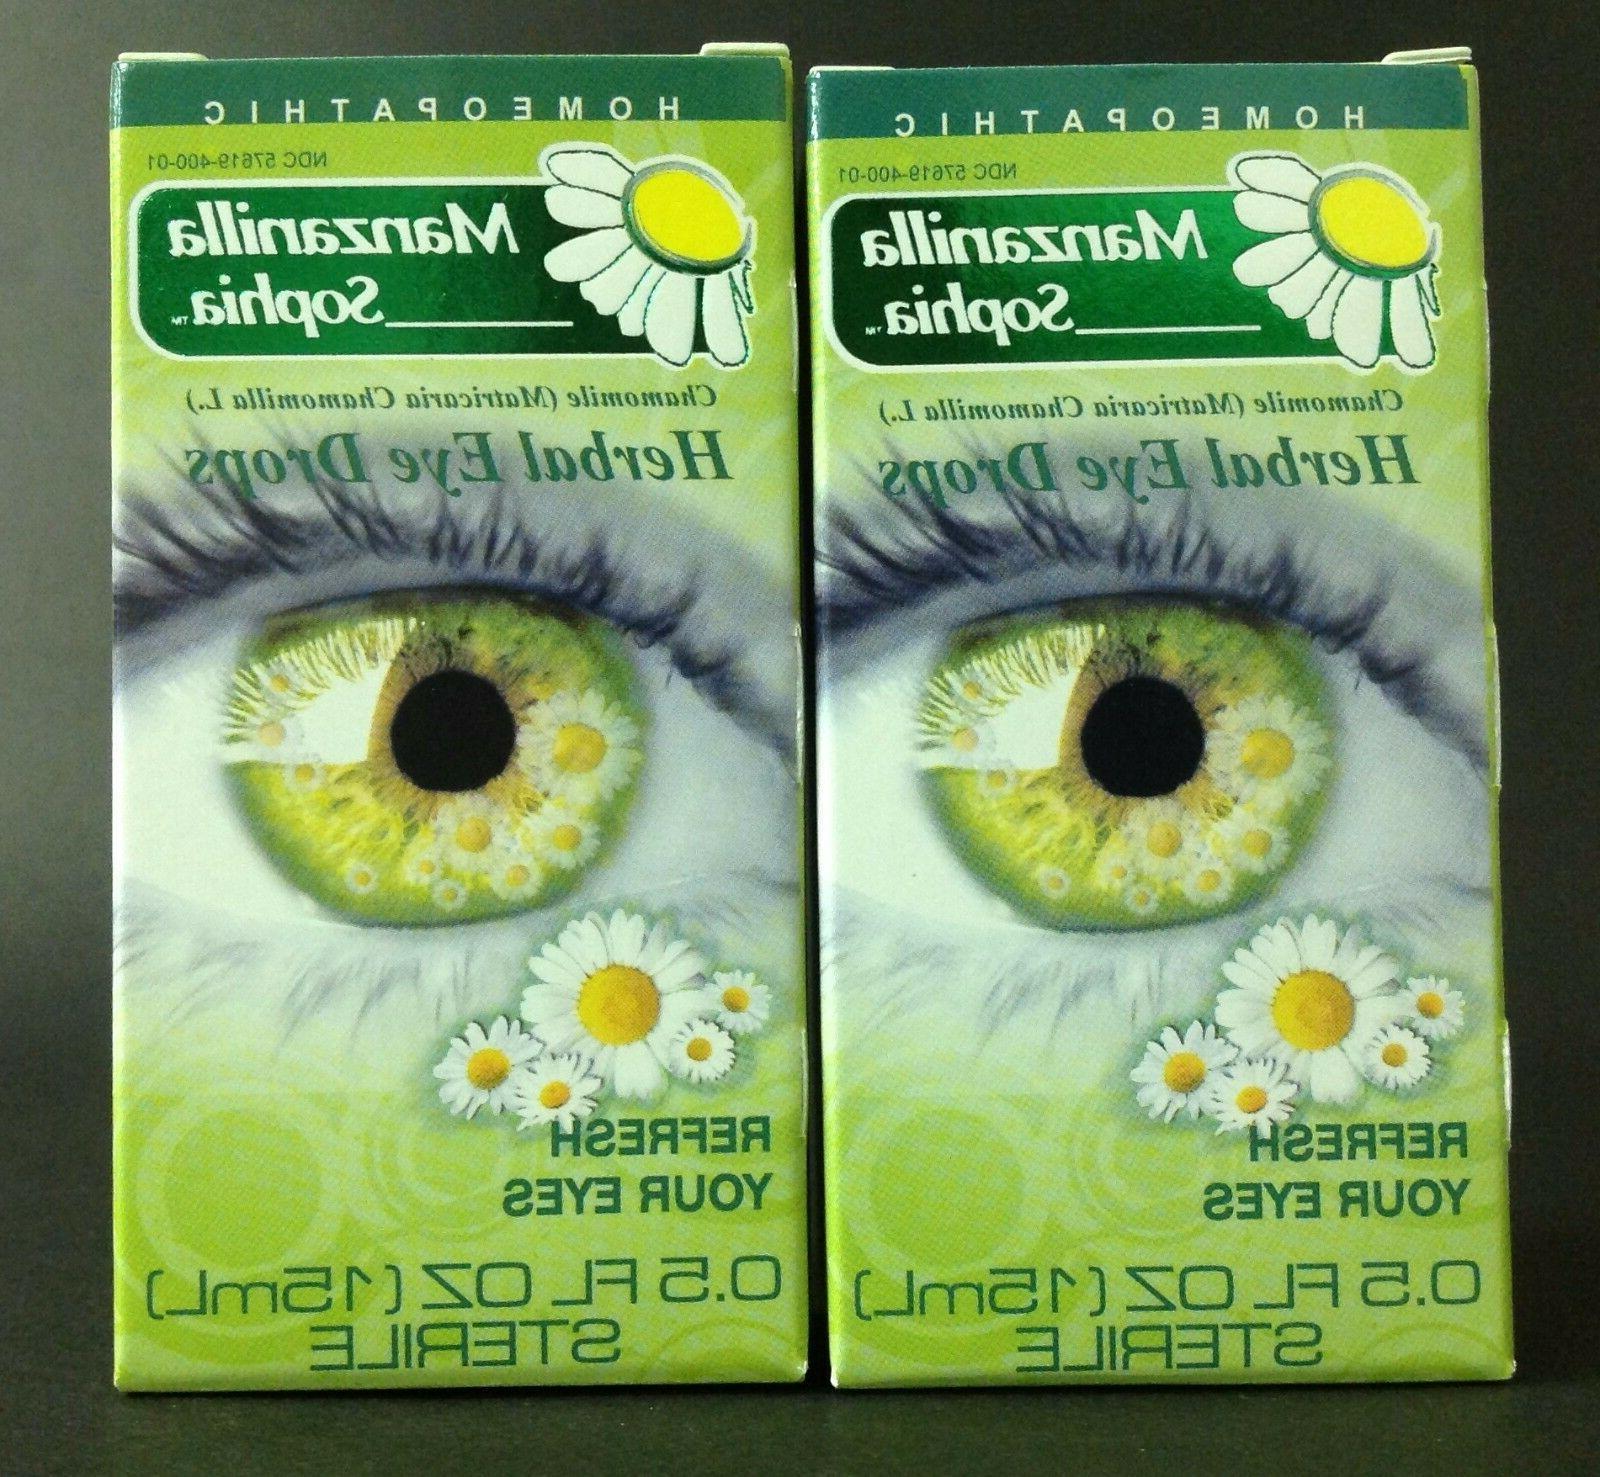 3 chamomile herbal eye drops